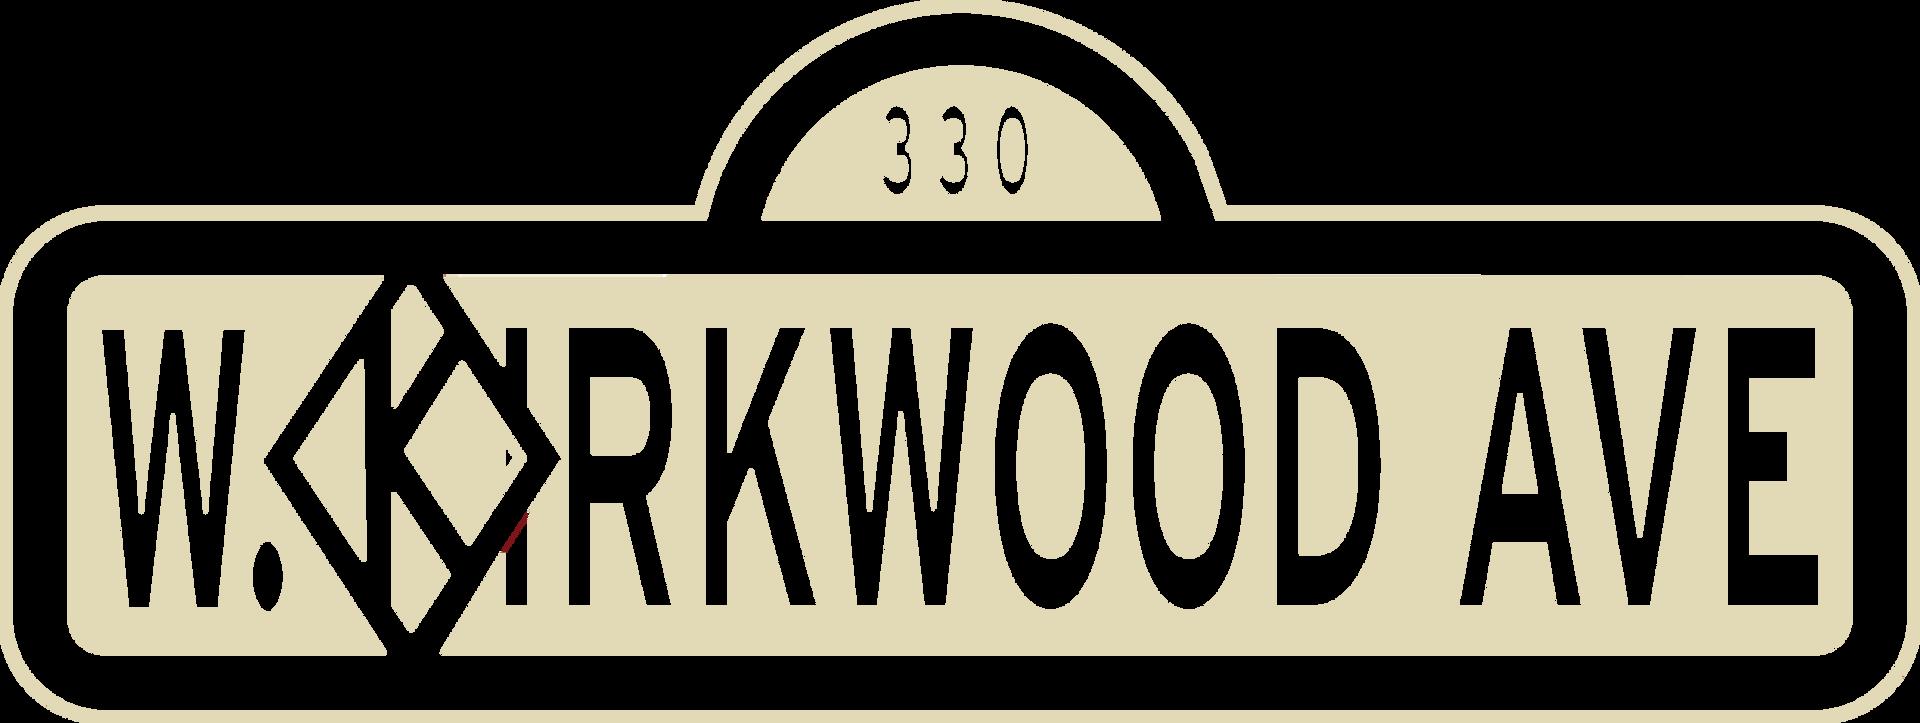 W-KRKWOOD AVE 3.png